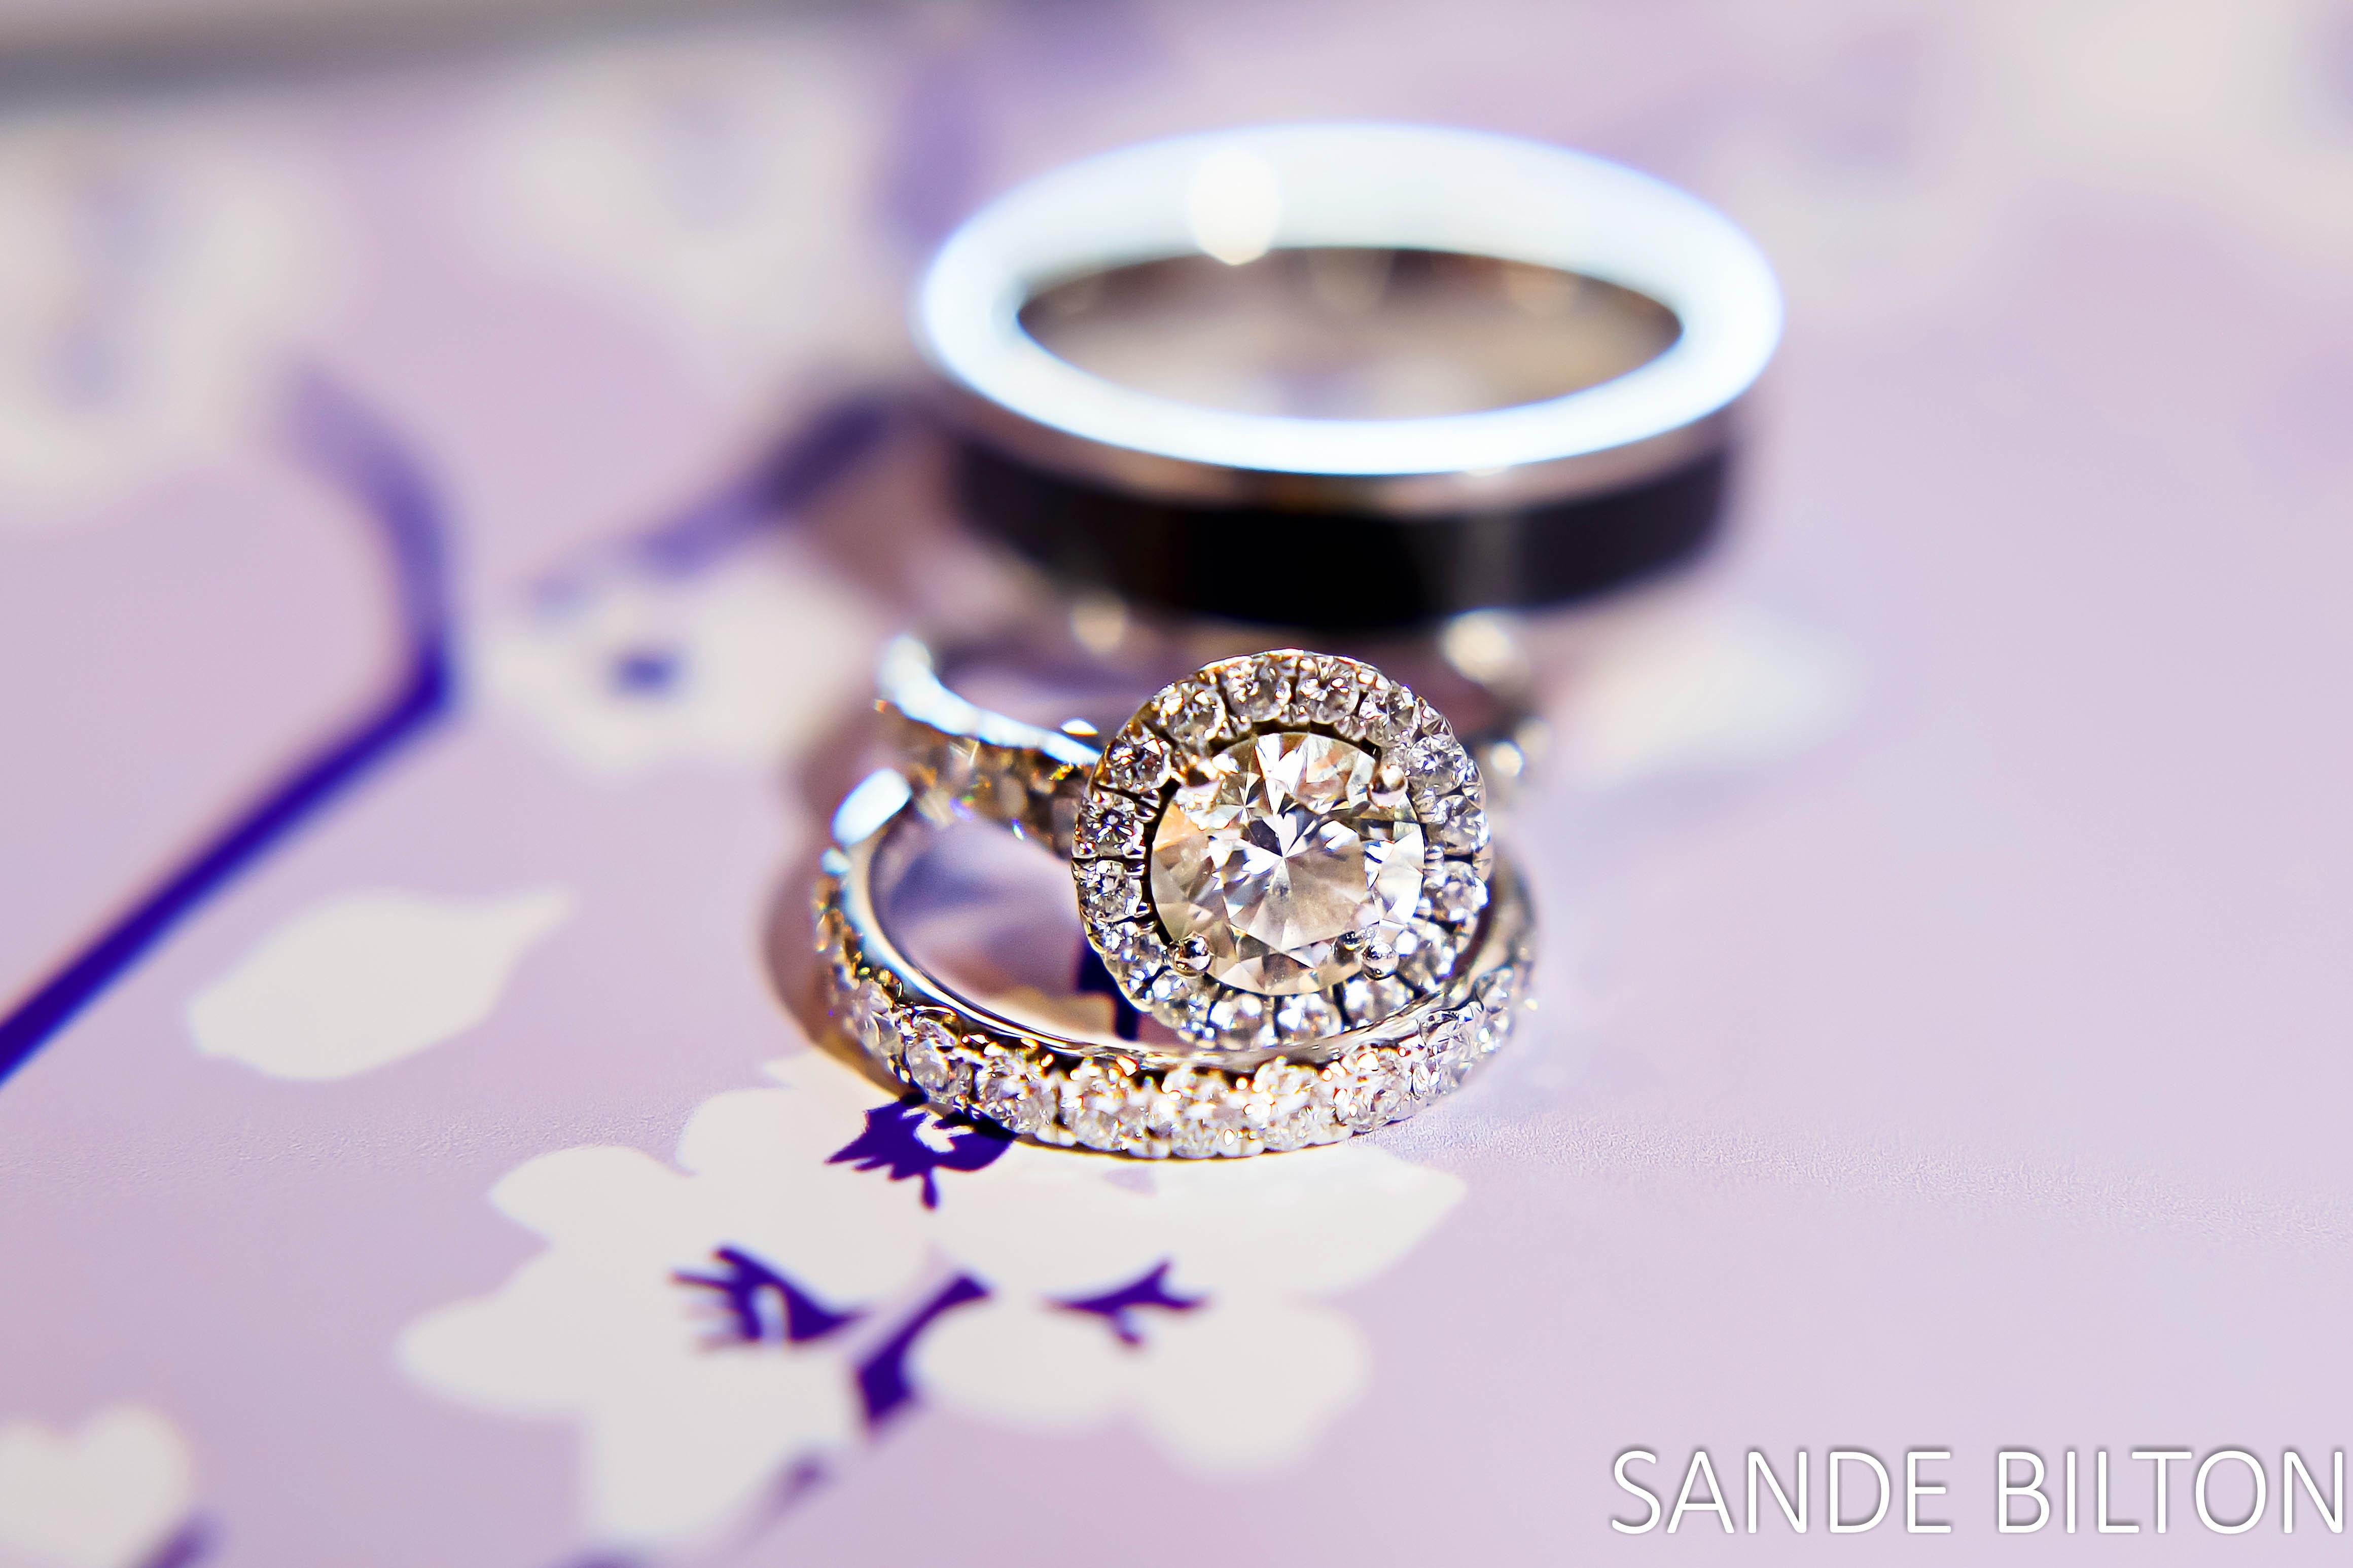 Shearly dating ring